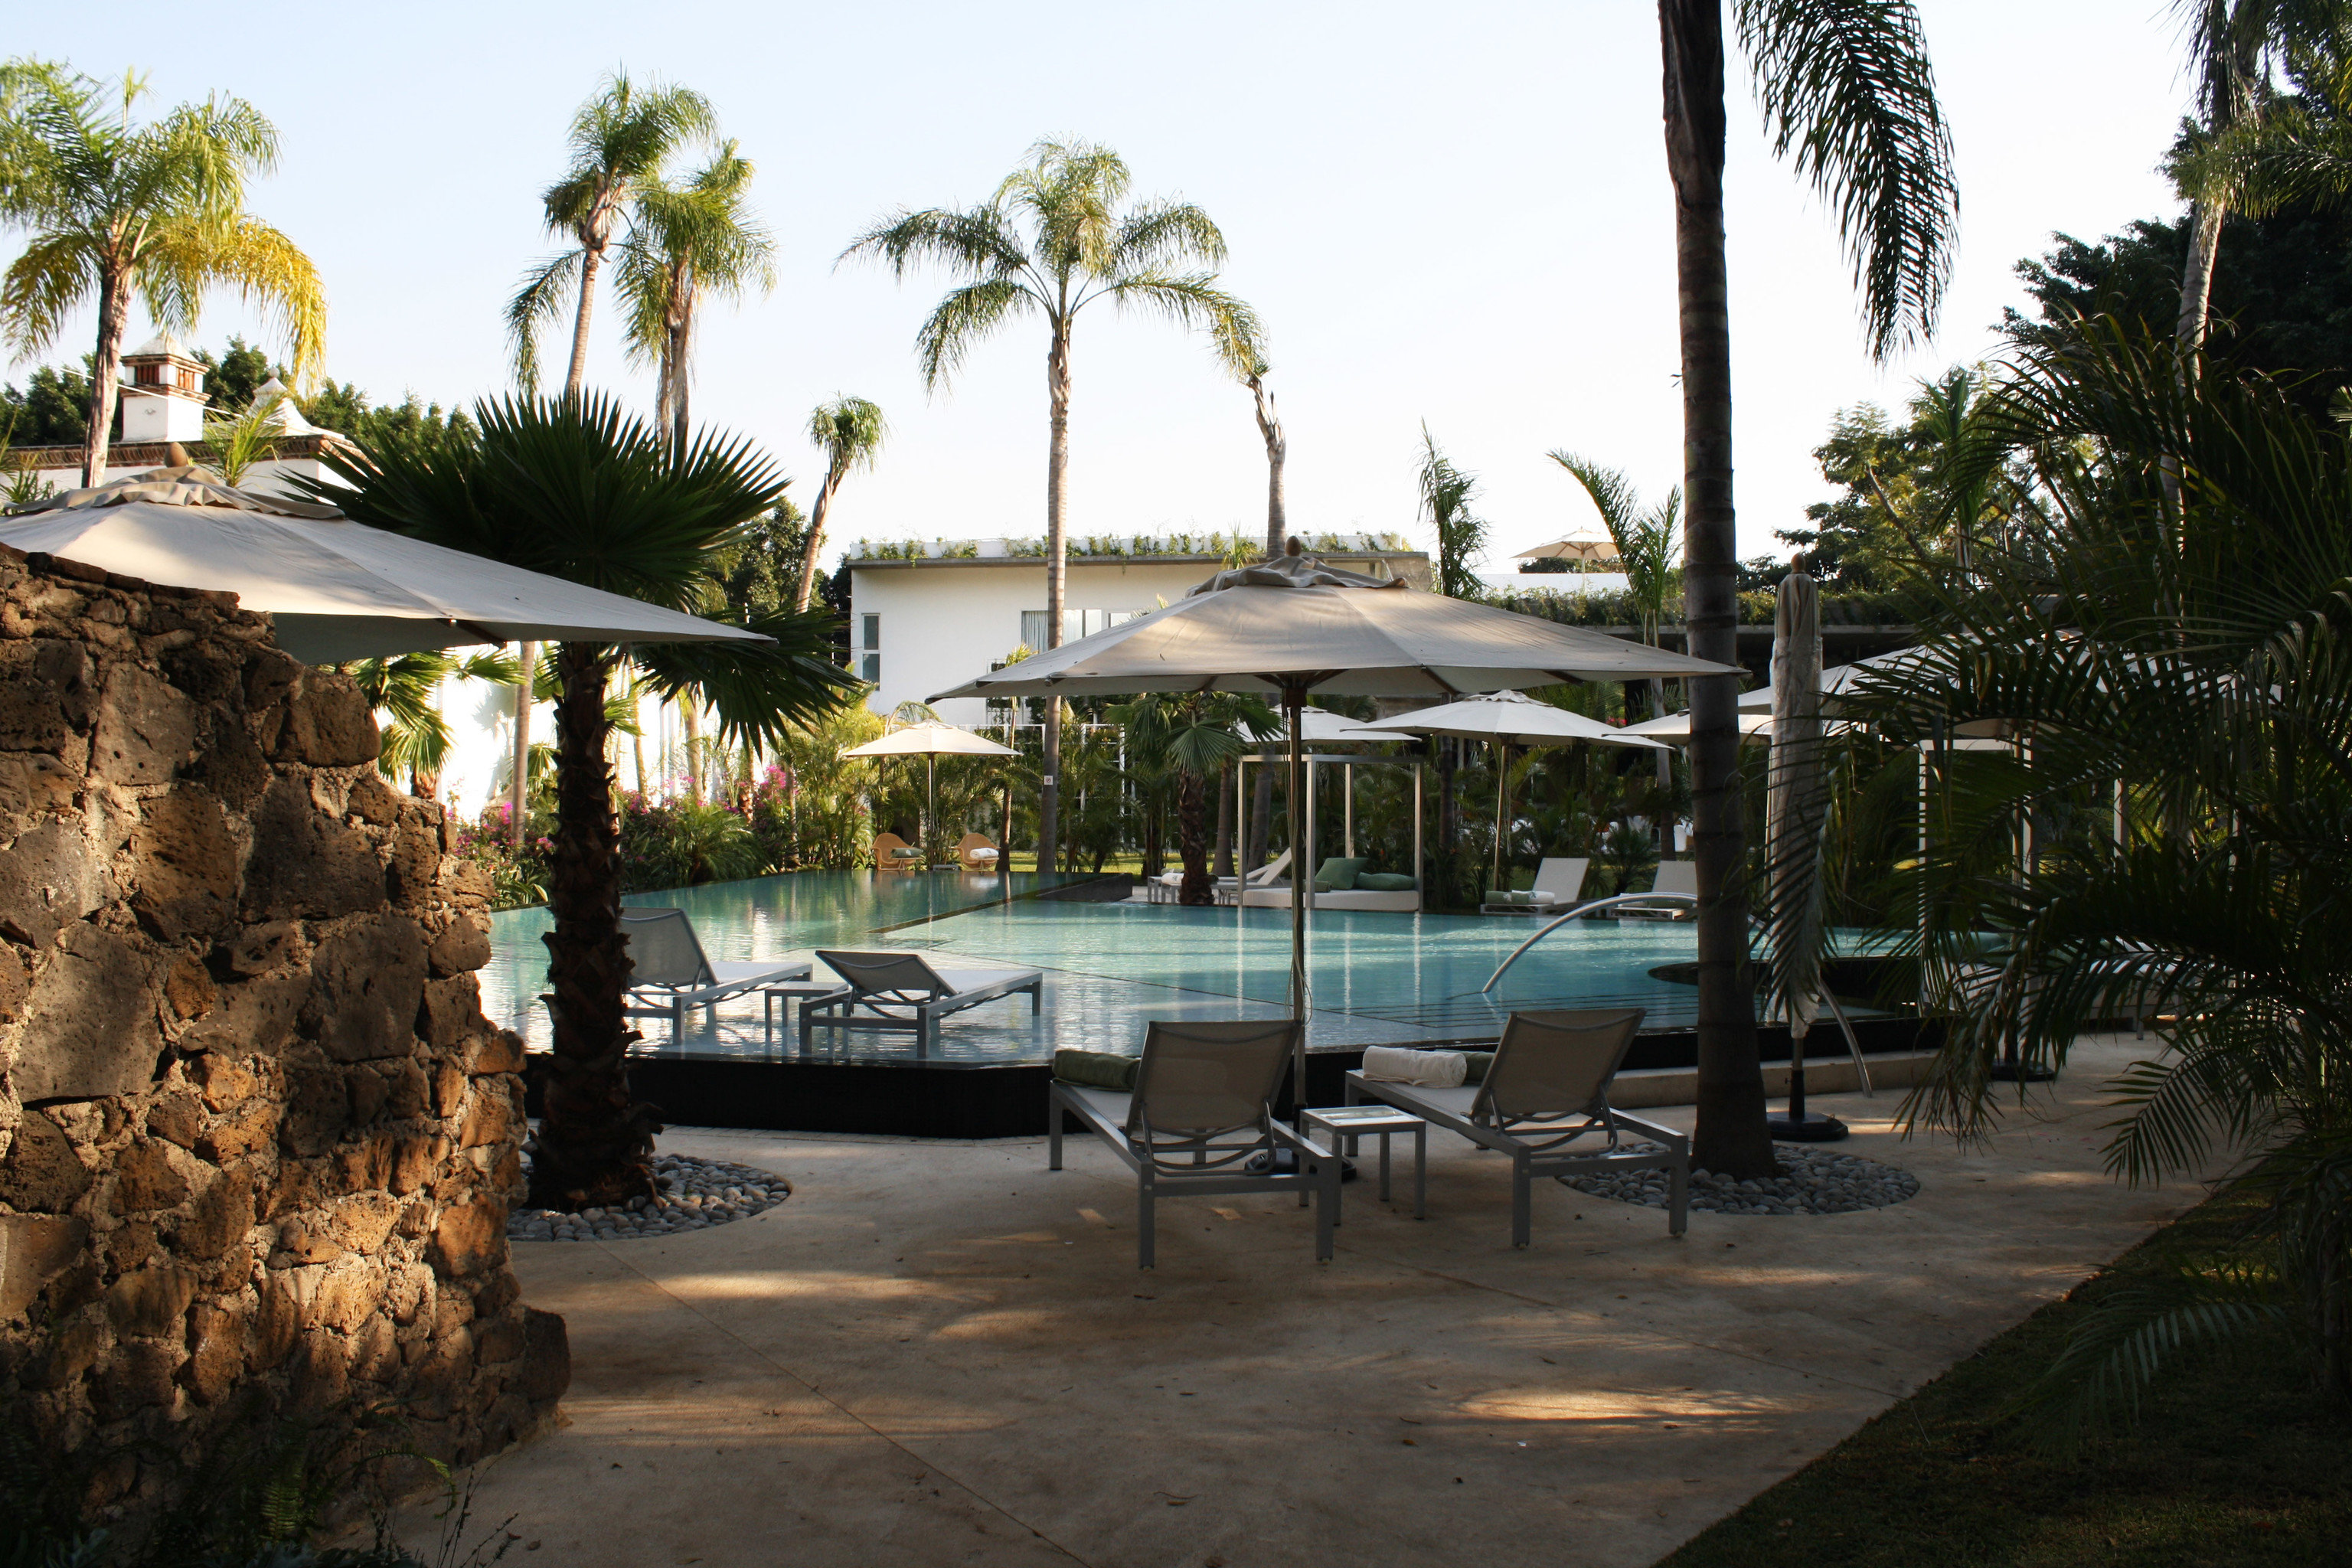 sky tree Resort arecales Beach restaurant swimming pool Villa shore shade